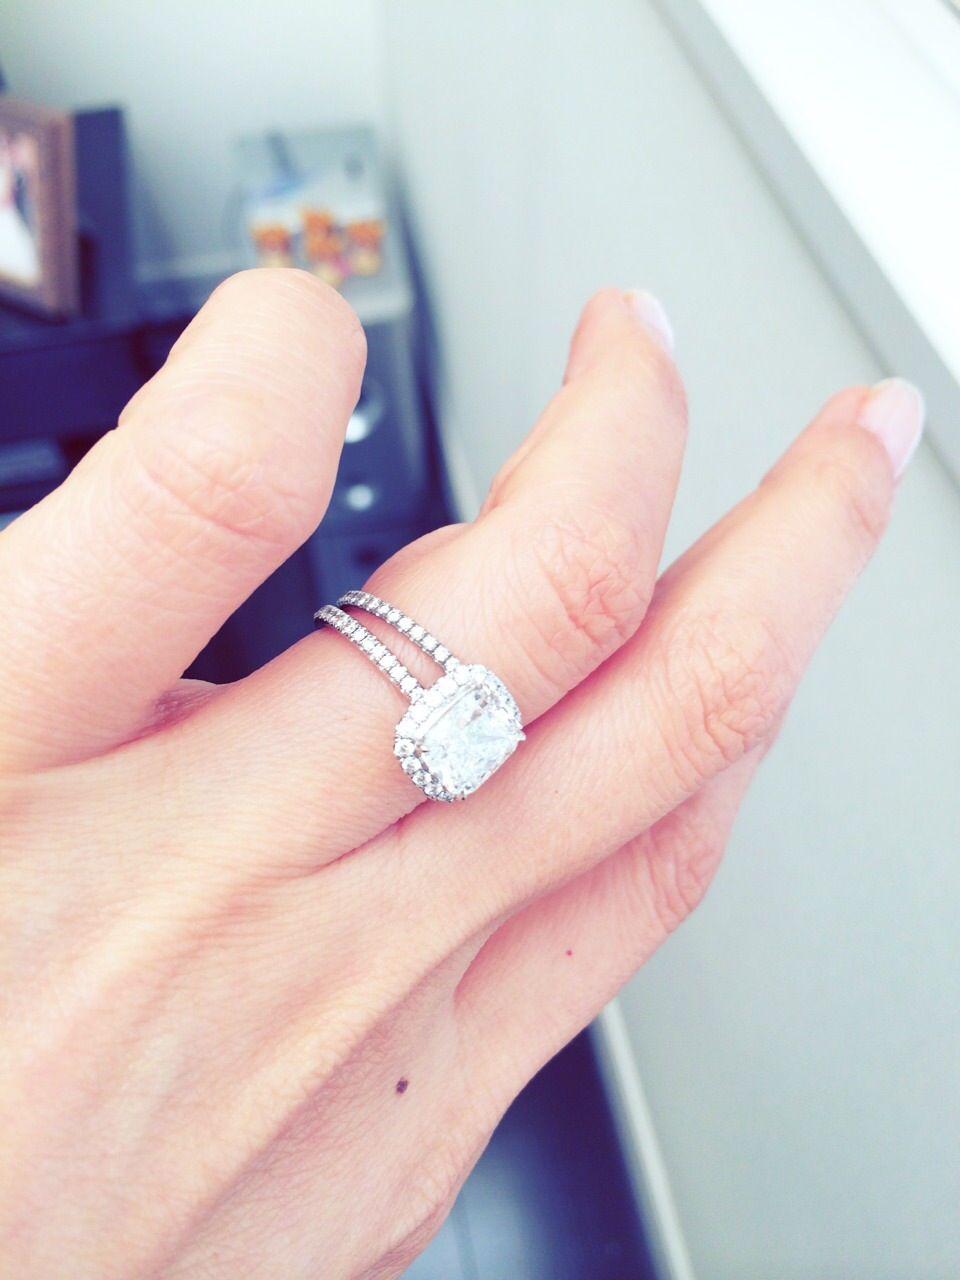 increadibly looking diamond ring by harry winston | My Dream Jewelry ...